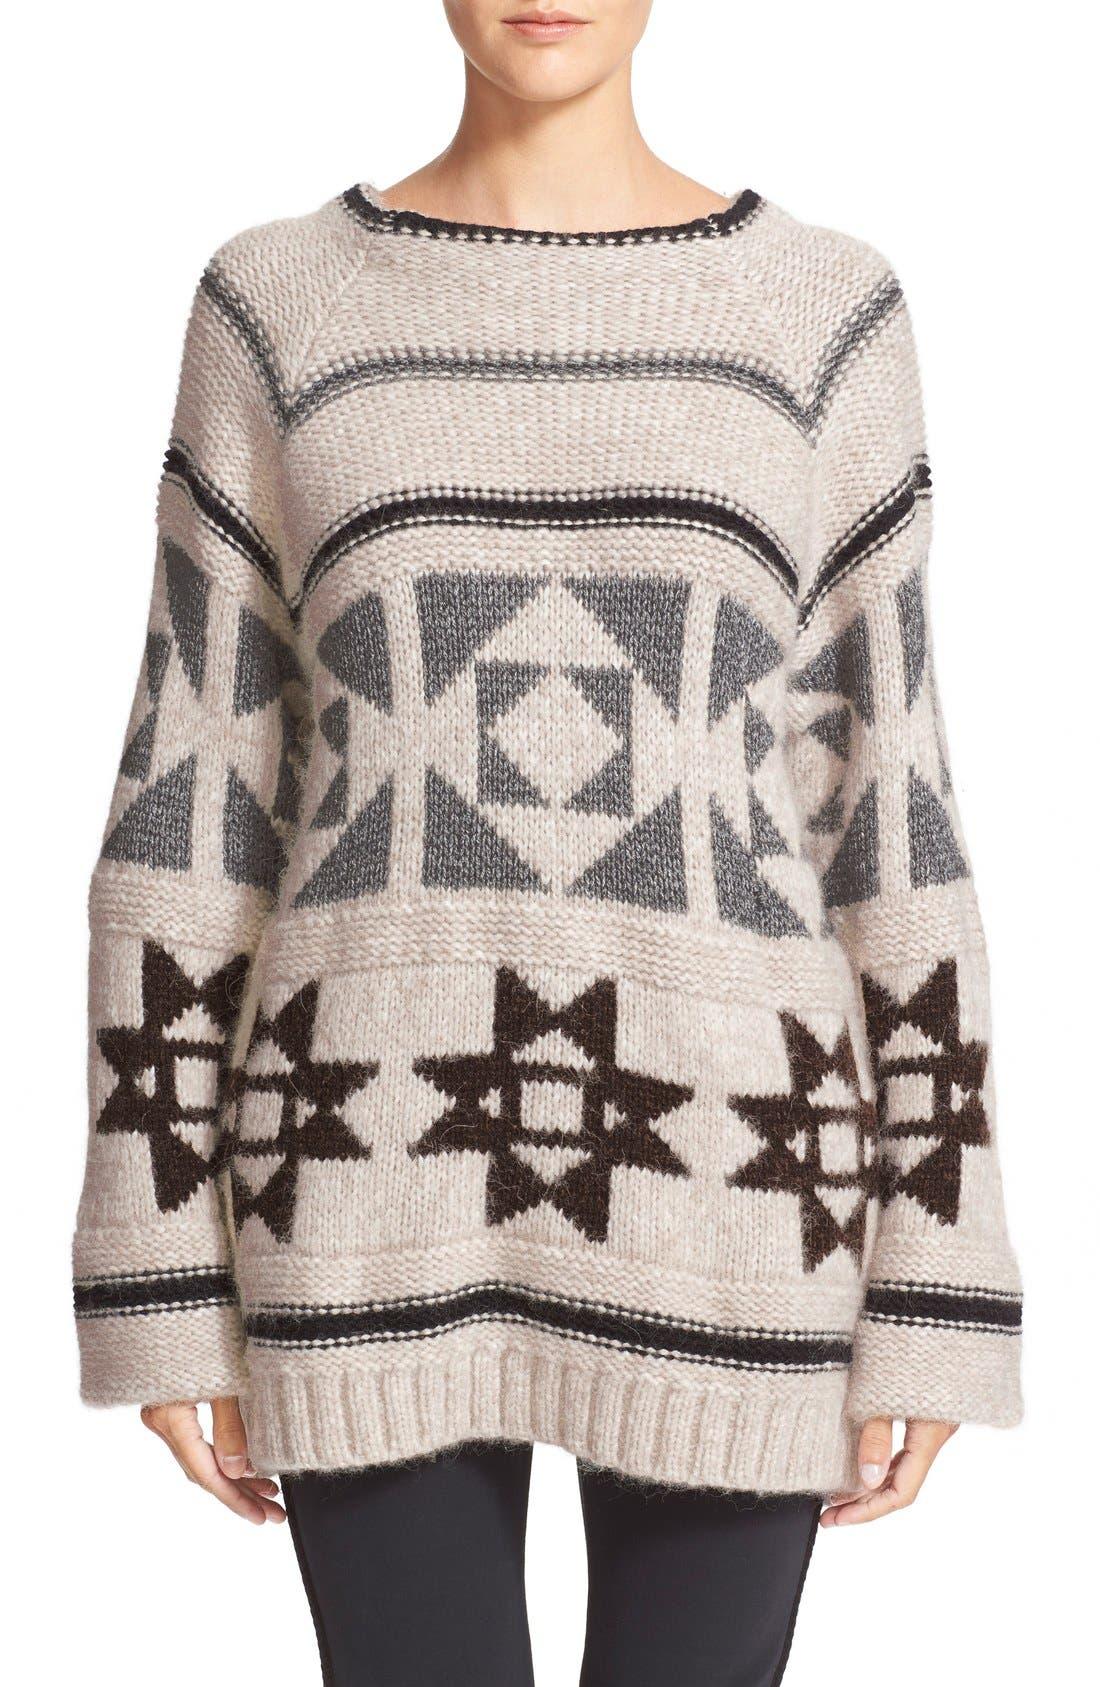 Alternate Image 1 Selected - Loma'Raine' Alpaca BlendSweater